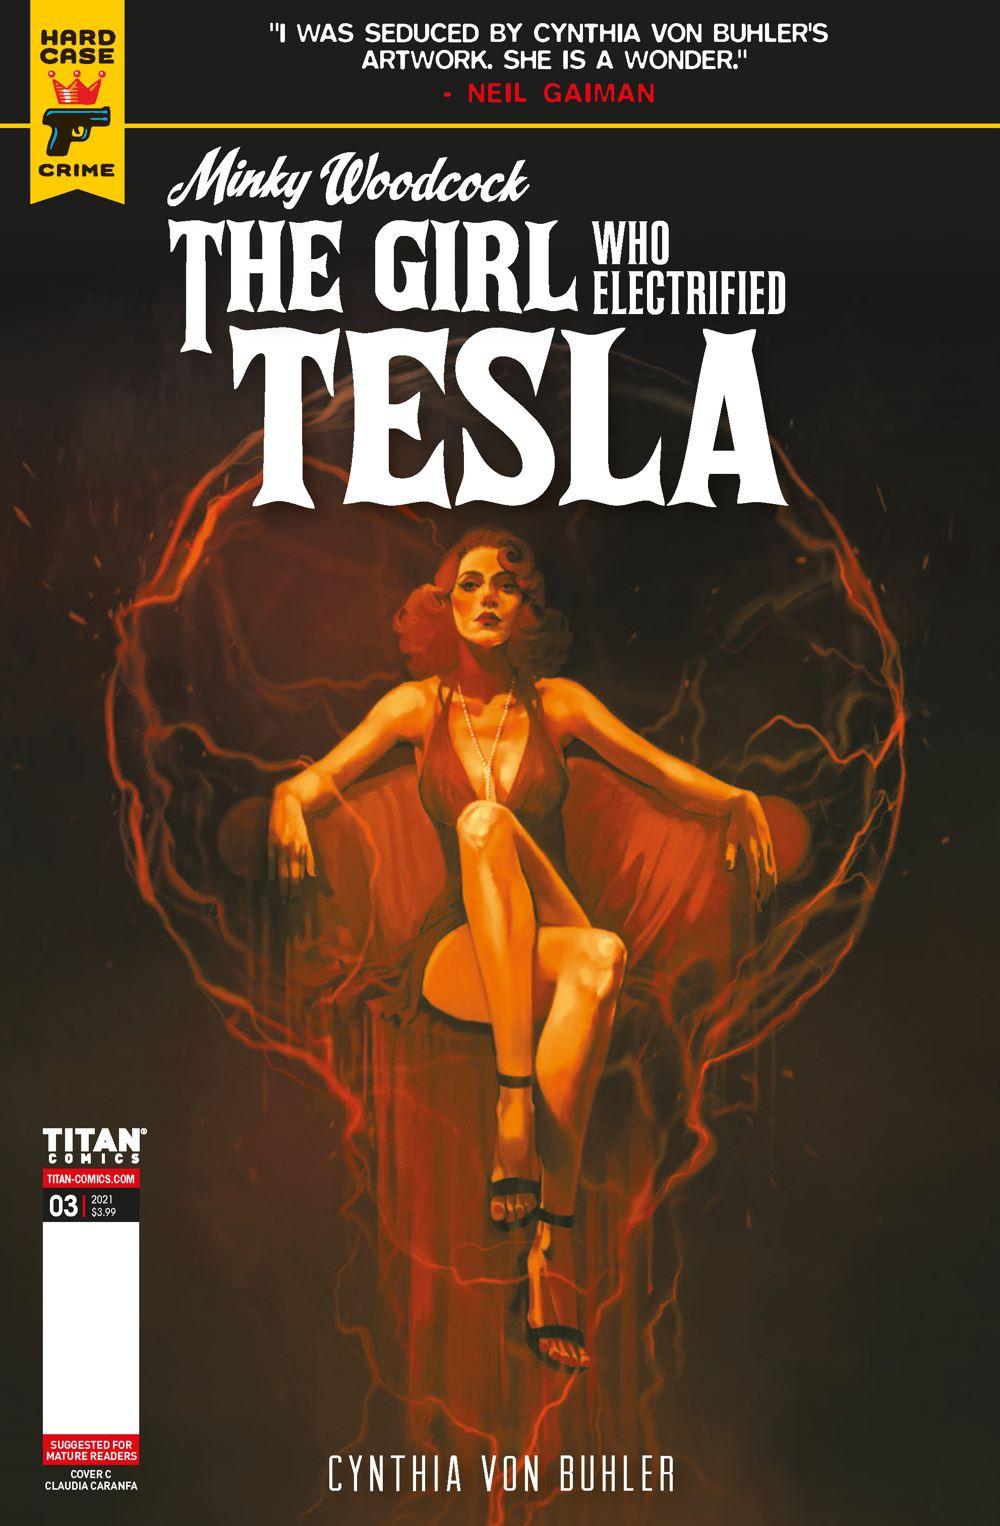 MINKY_WOODCOCK_ARC2_3_COVER_Page_3 ComicList Previews: MINKY WOODCOCK THE GIRL WHO ELECTRIFIED TESLA #3